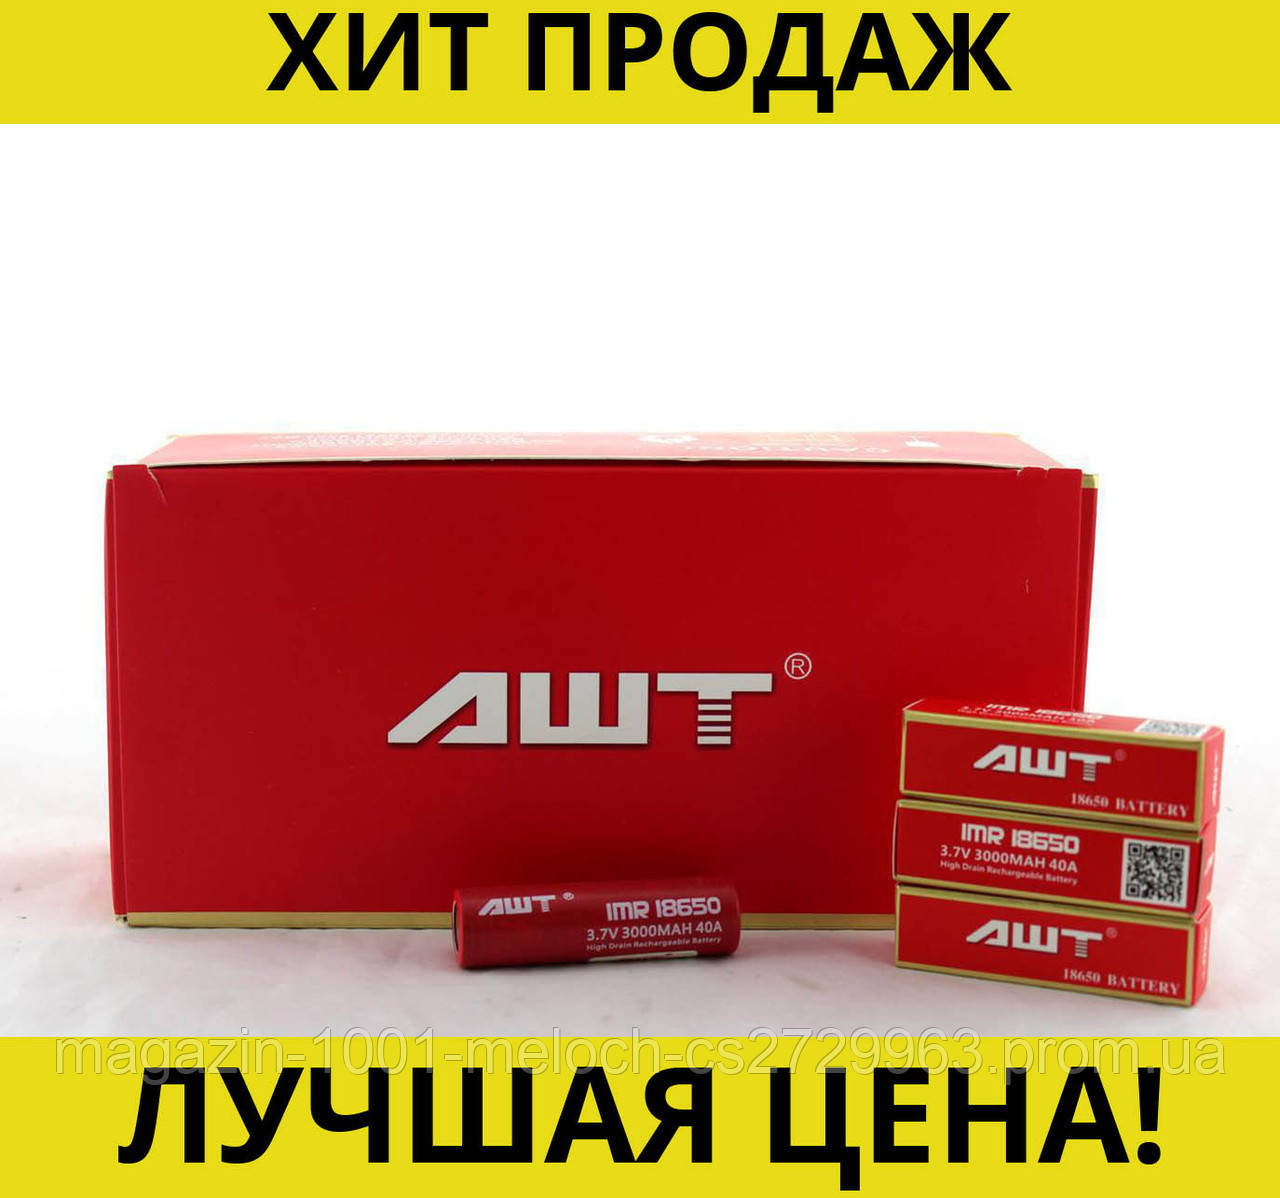 Батарейка BATTERY 18650 AWT red для сигарет- Новинка